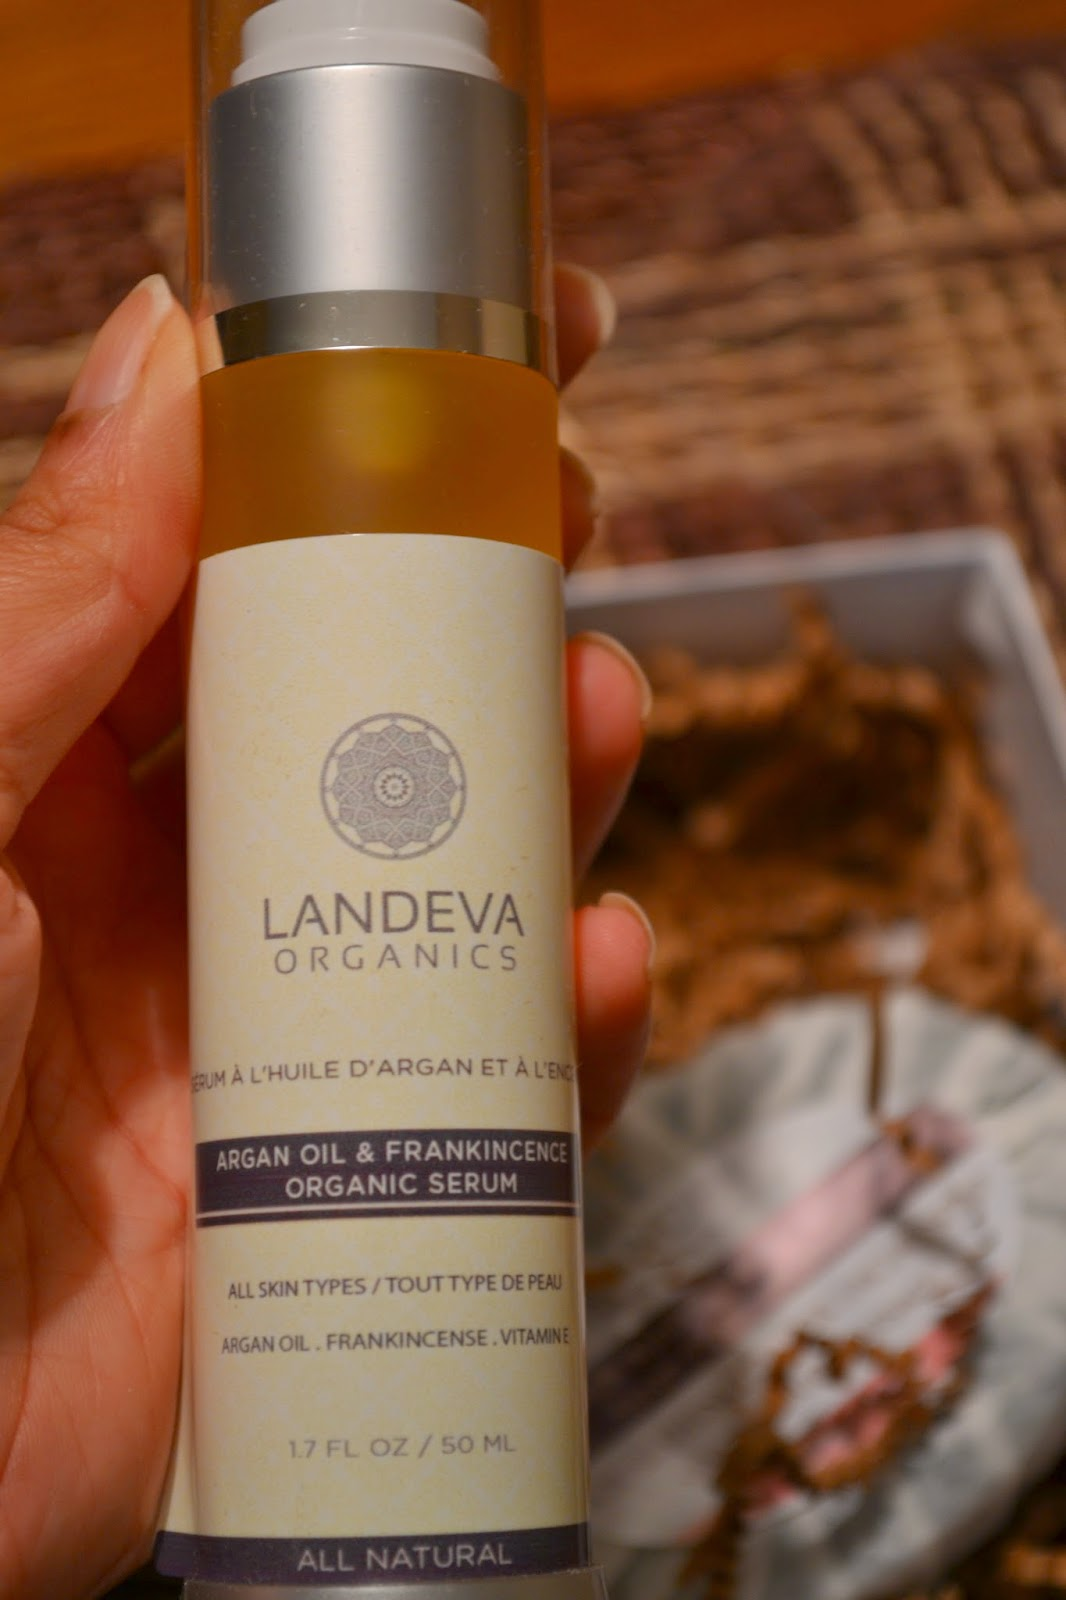 Landeva Organics Argan Oil and Frankincense Organic Serum